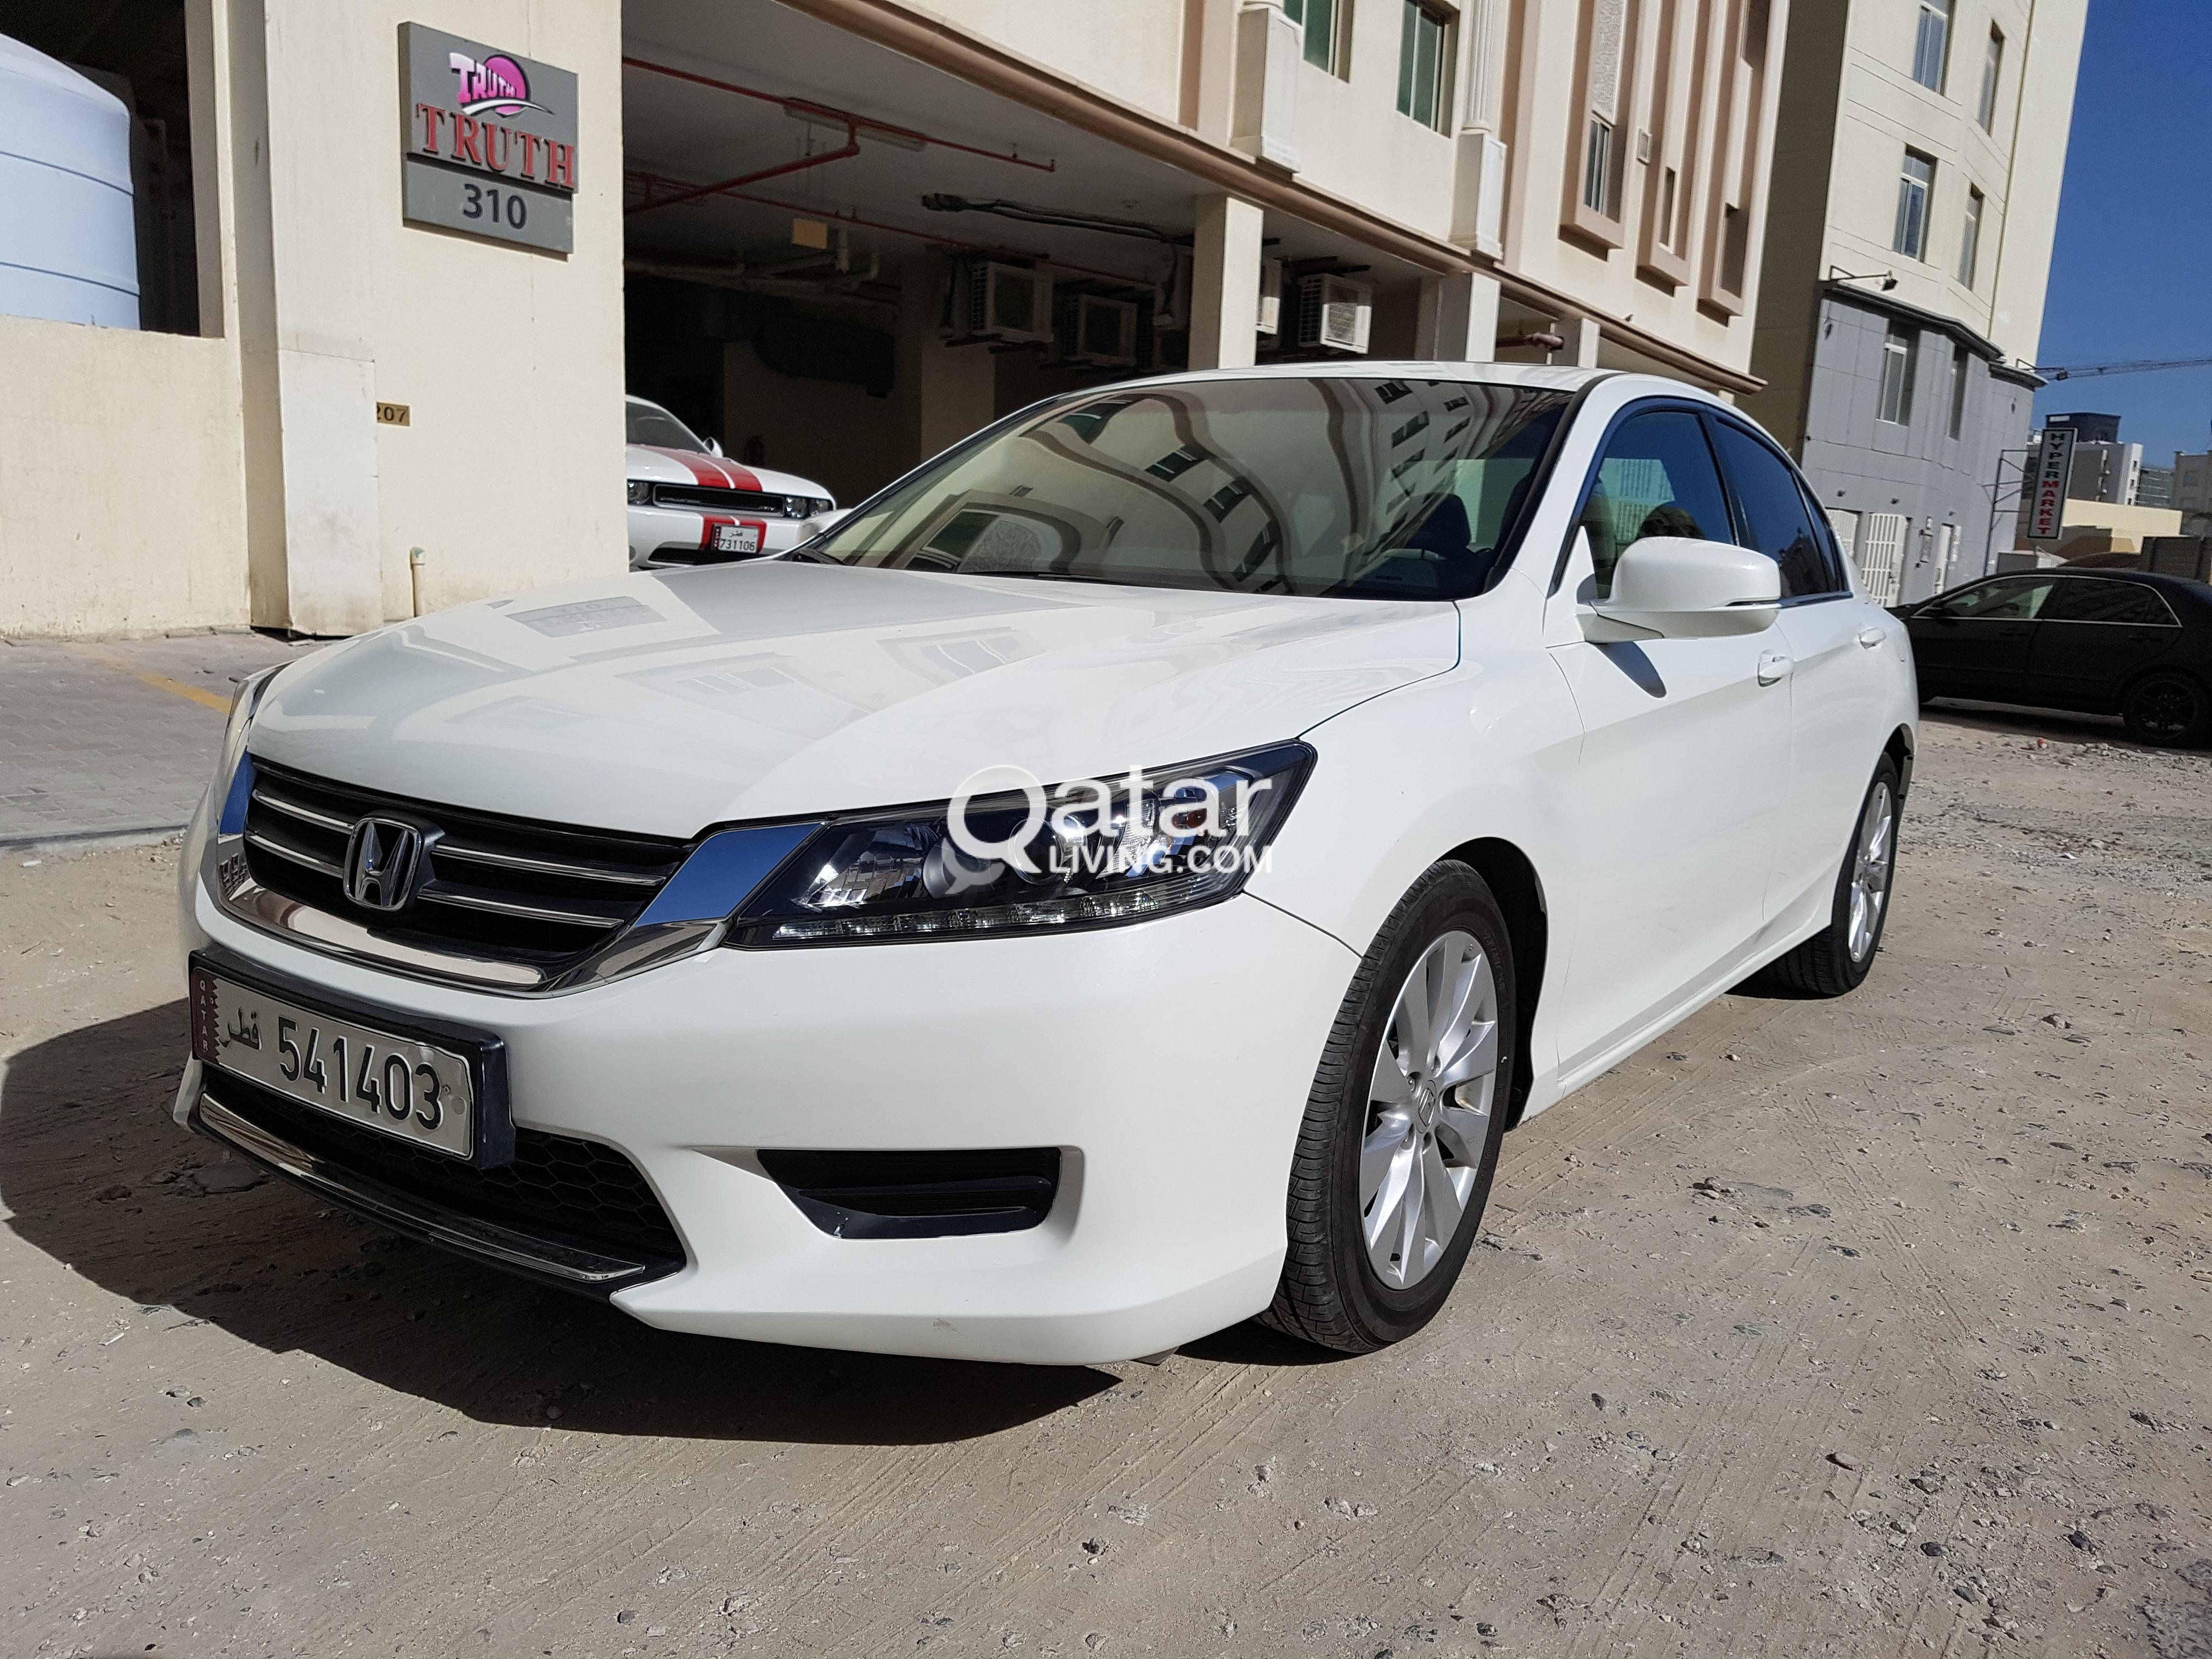 Qatar Living Car Sale - Cars Models